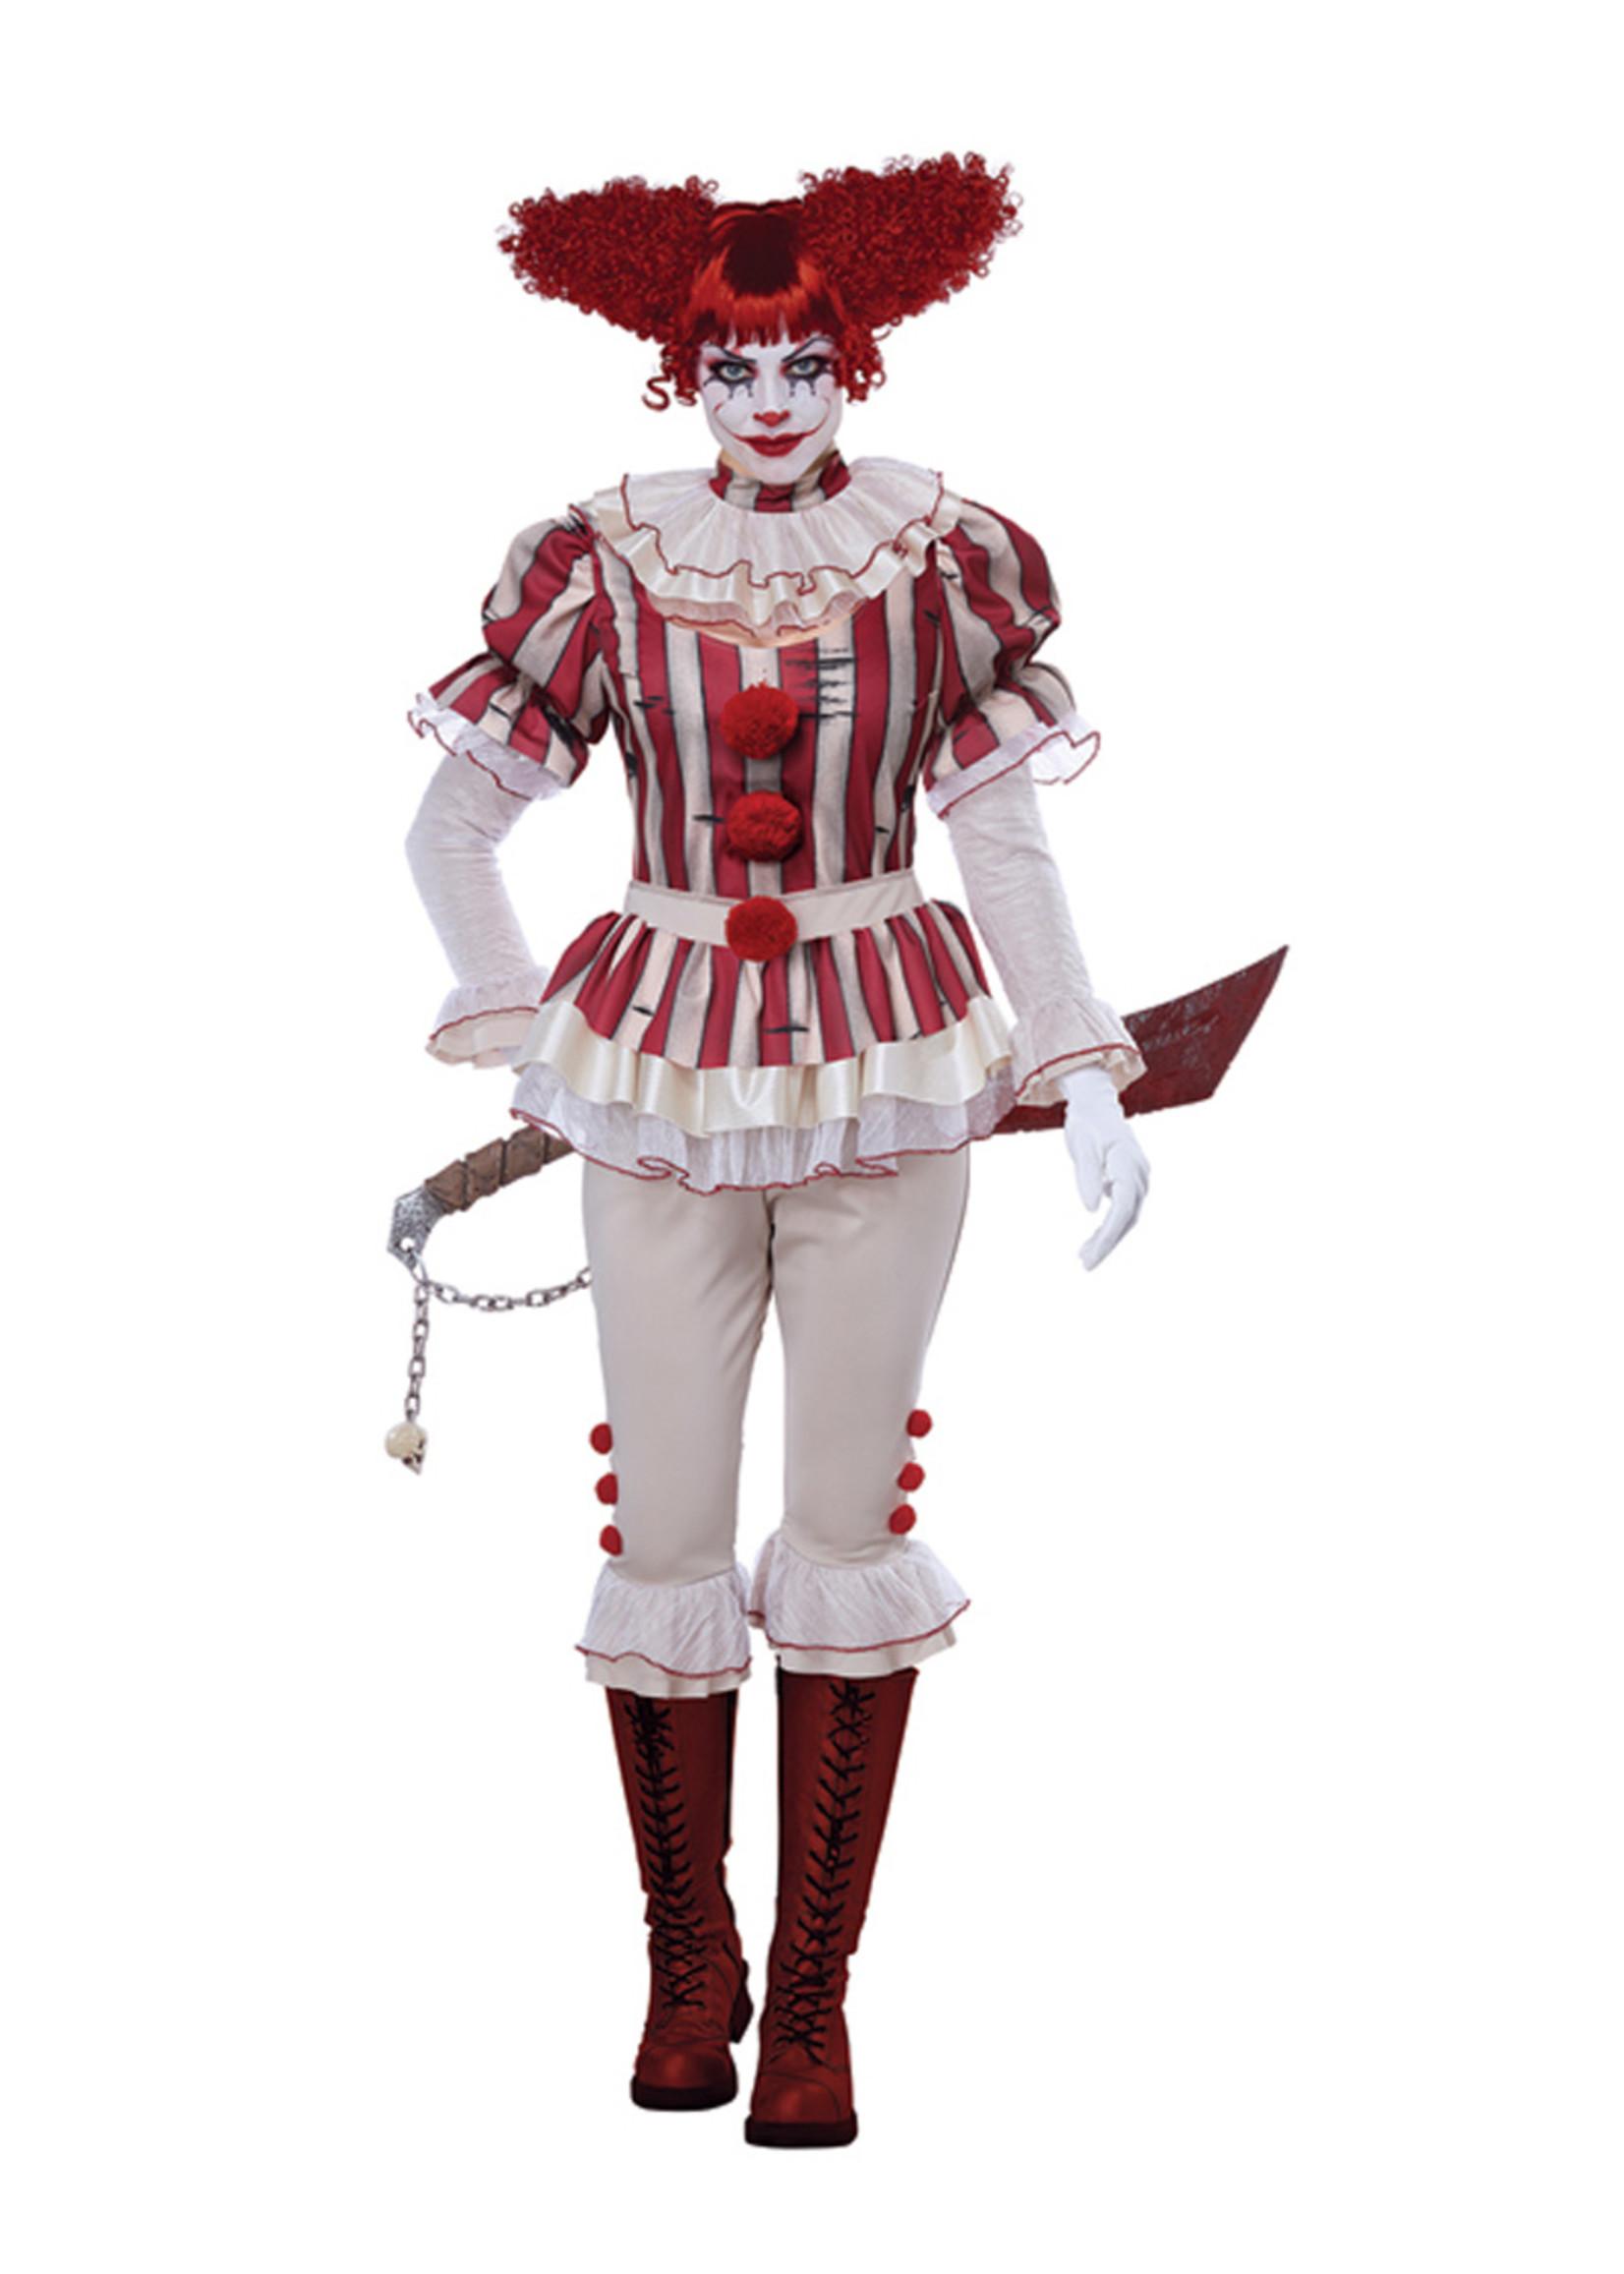 Sadistic Clown Costume - Women's